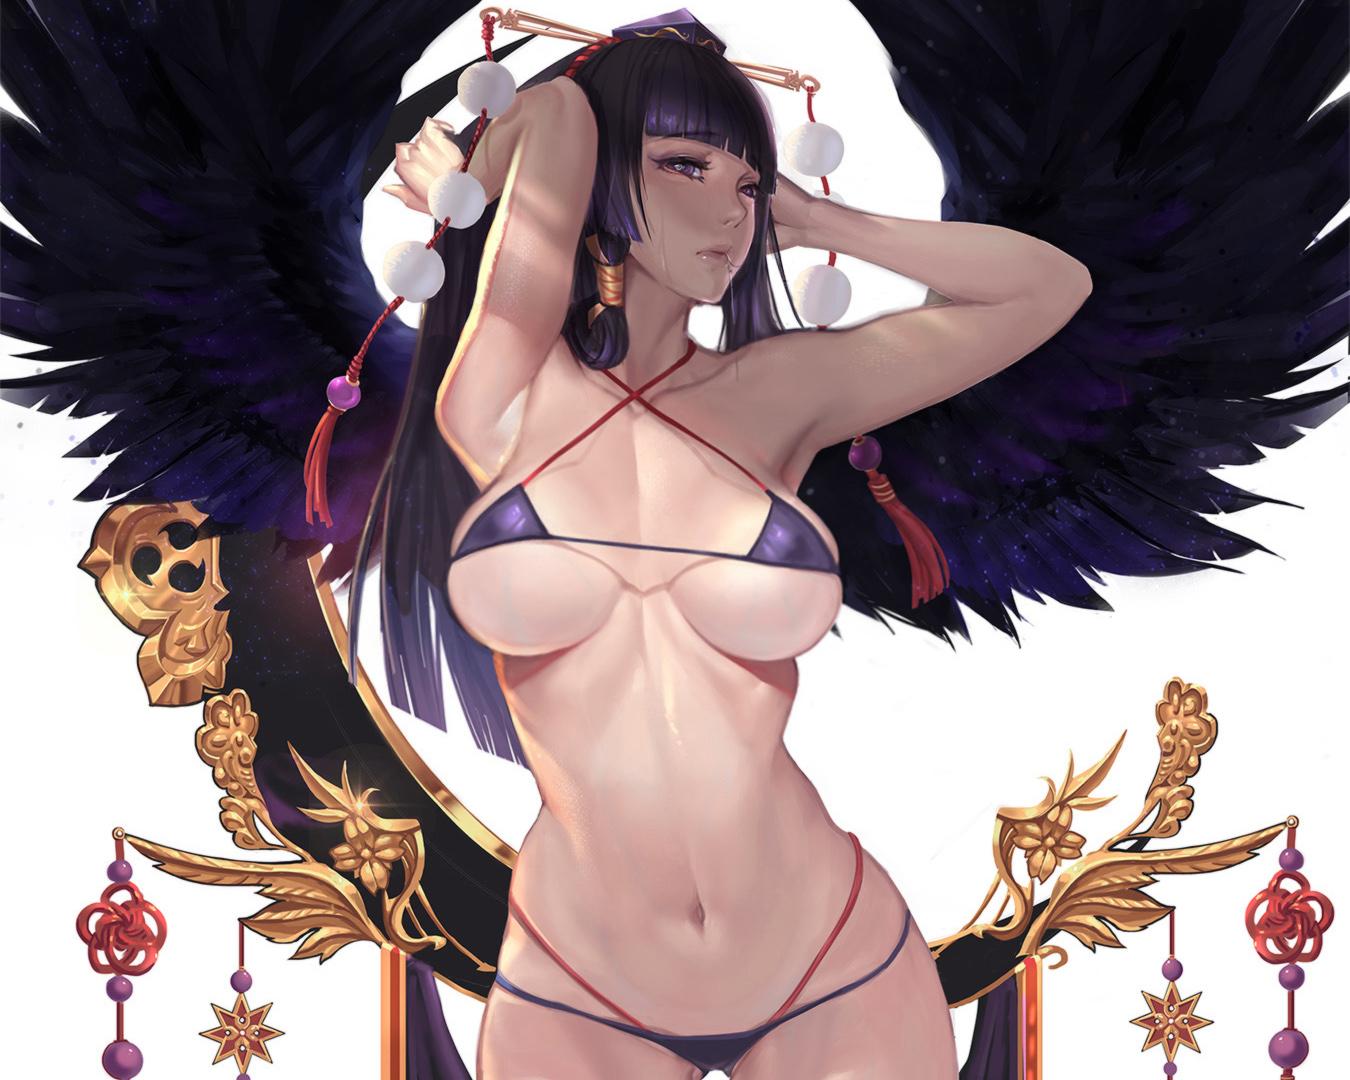 bikini cropped dead_or_alive feathers gtunver headdress navel nyotengu swimsuit underboob white wings